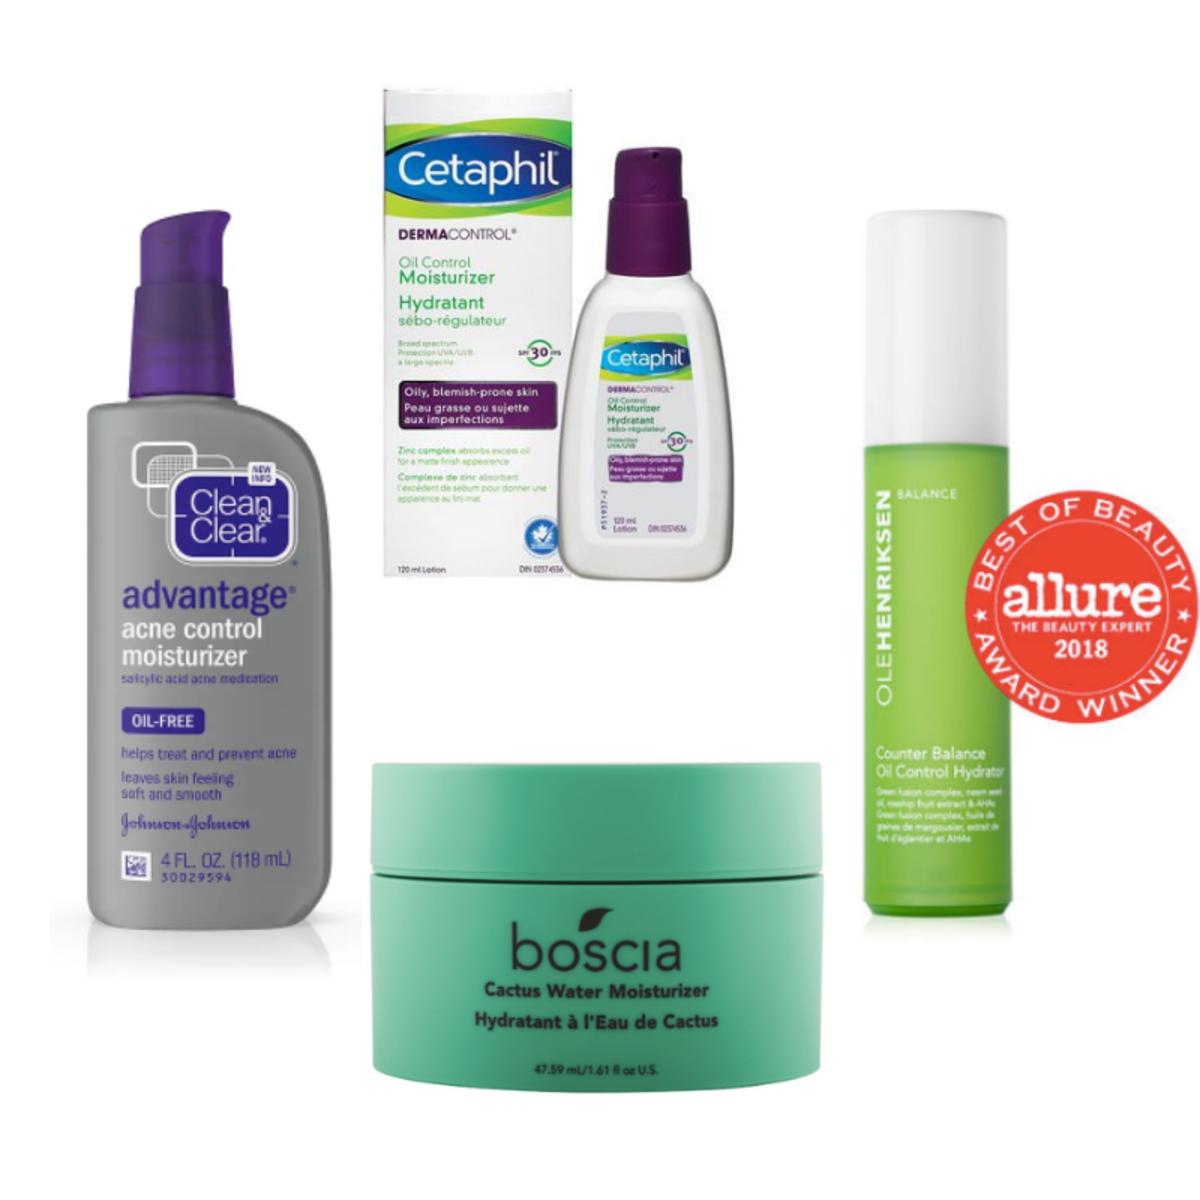 CFoilyskinmoisturizers Skin care routine, Moisturizer